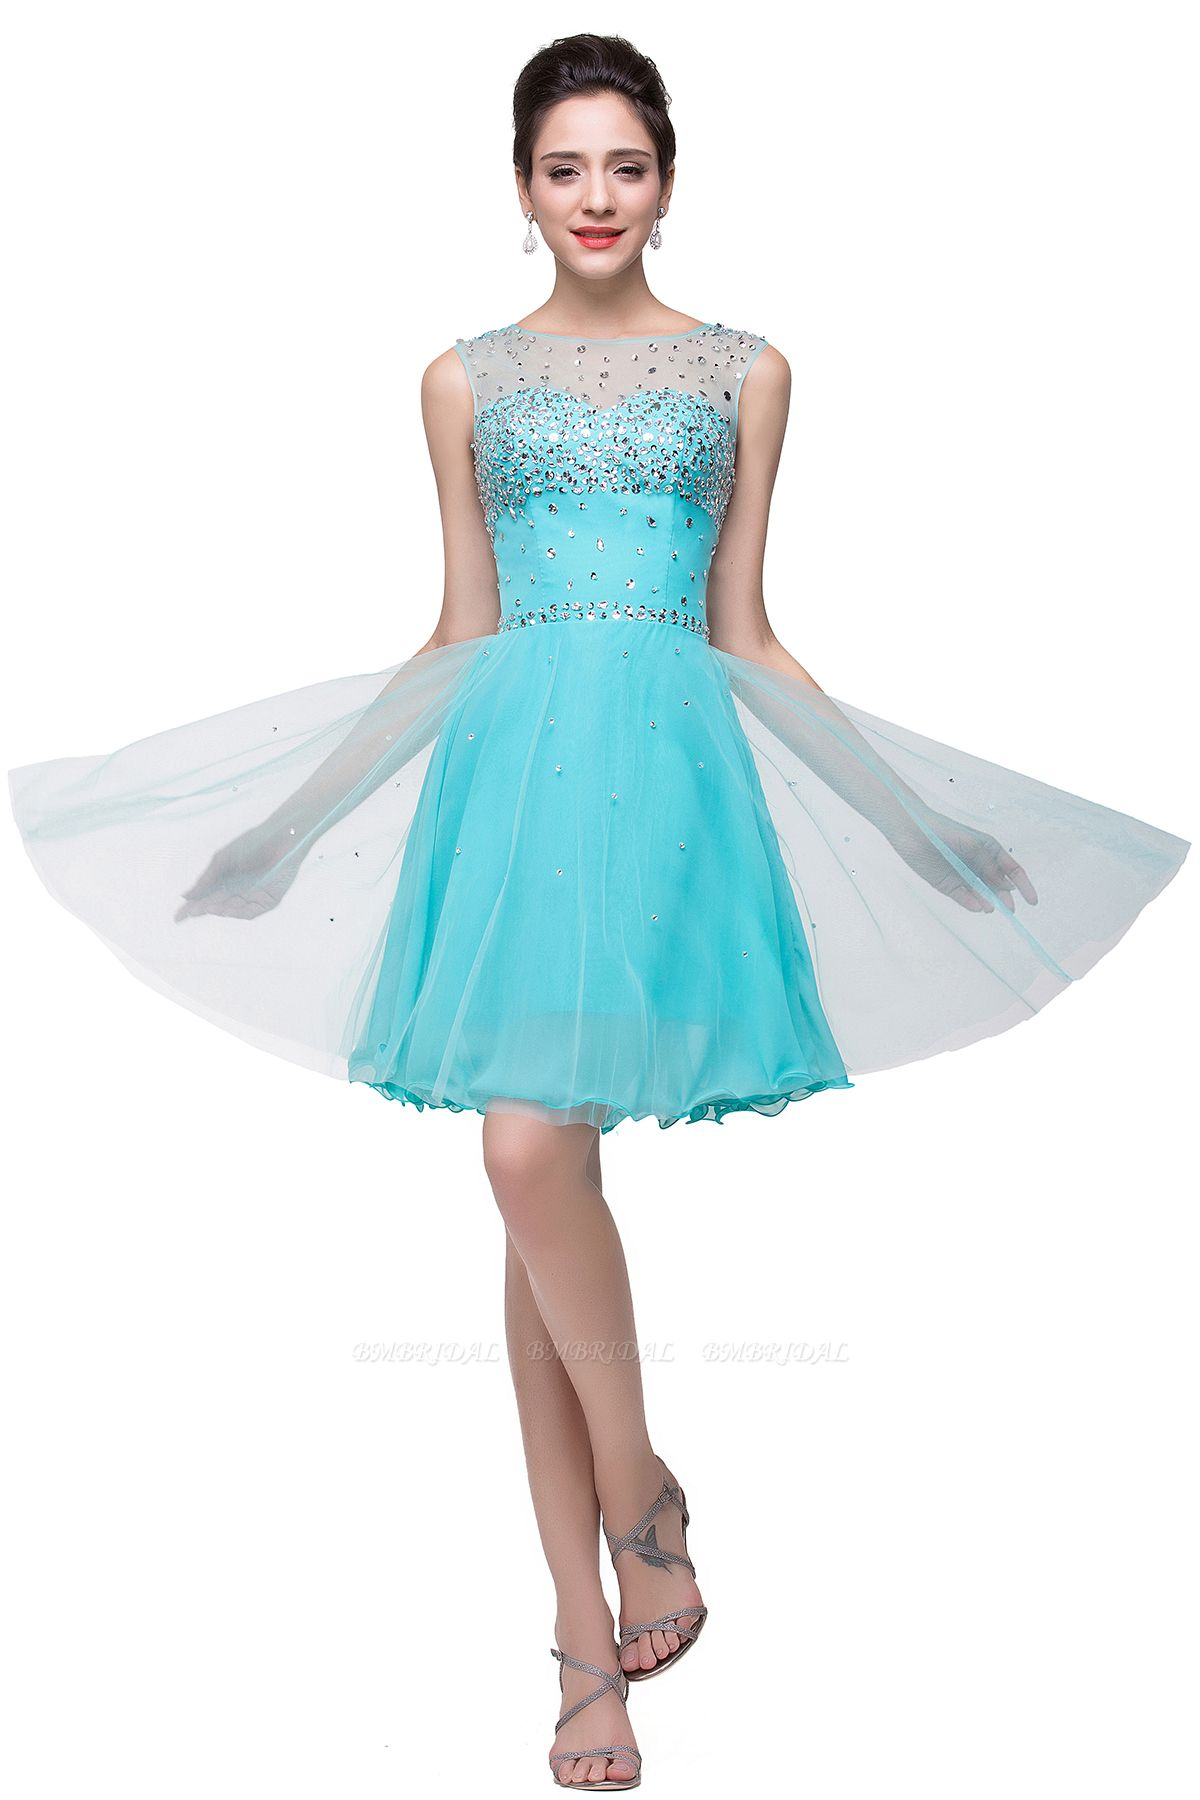 BMbridal Open Back Sleeveless Chiffon Homecoming Dress Crystal Beads Tulle Short Prom Dress